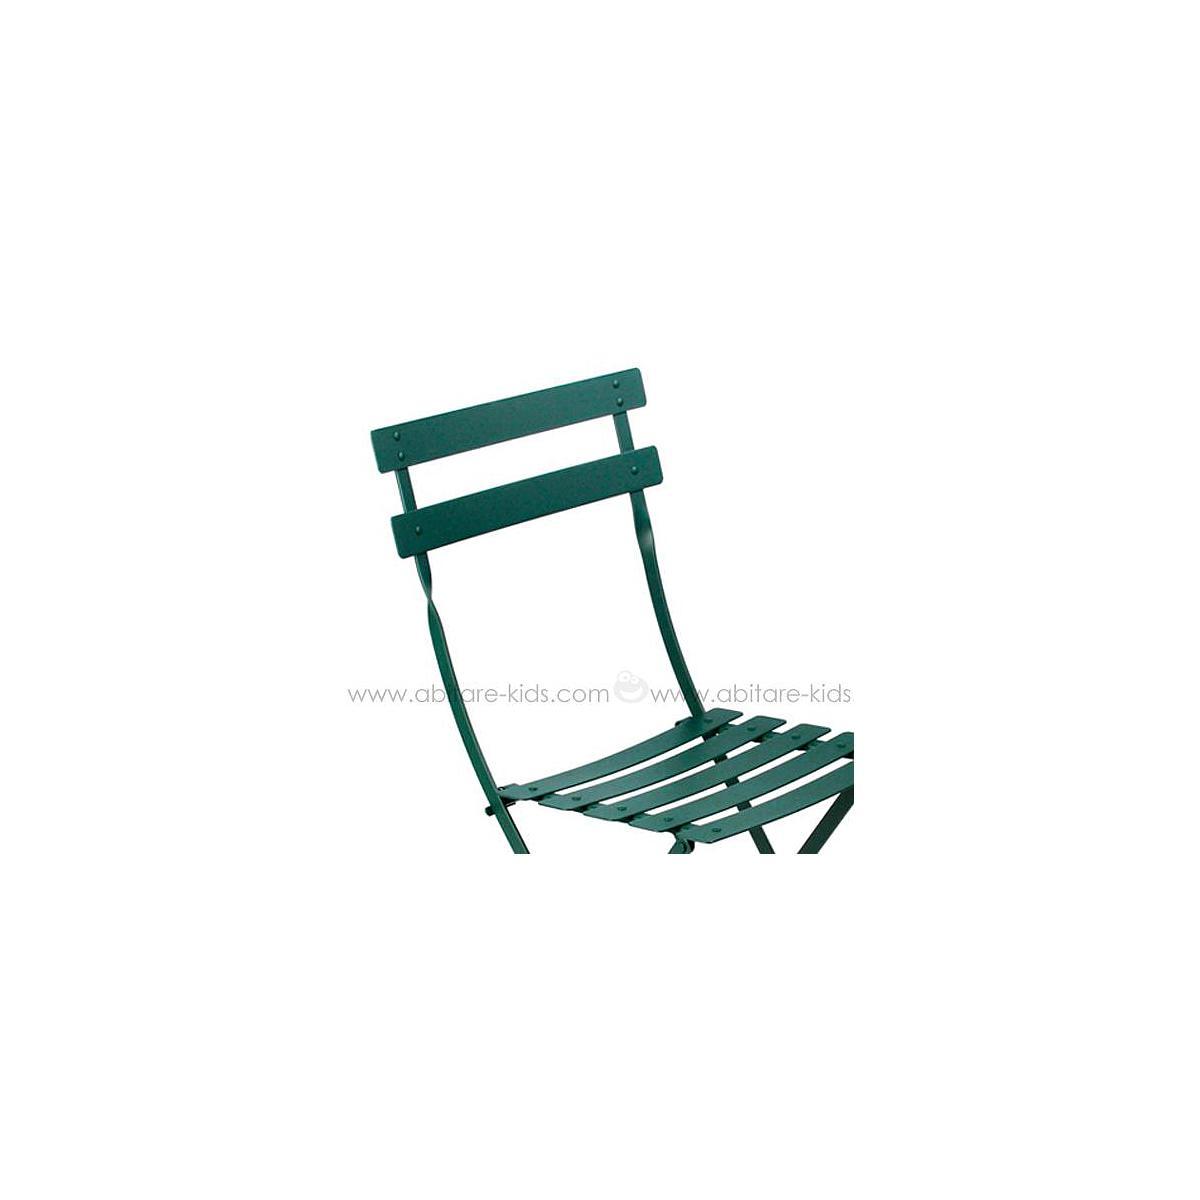 BISTRO by Fermob Chaise pliante vert cèdre